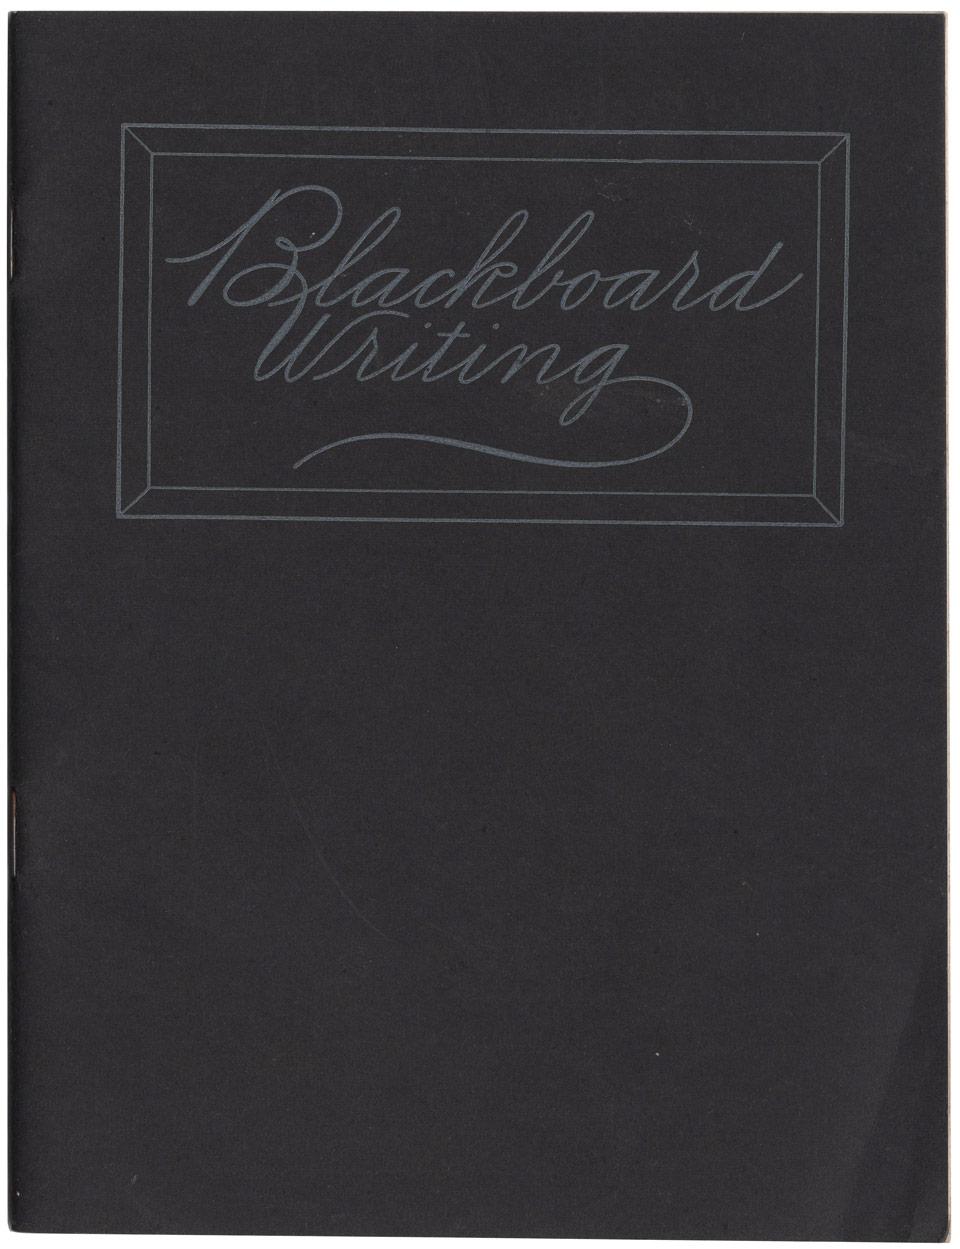 Masgrimes Blackboard Writing - blackboard penmanship